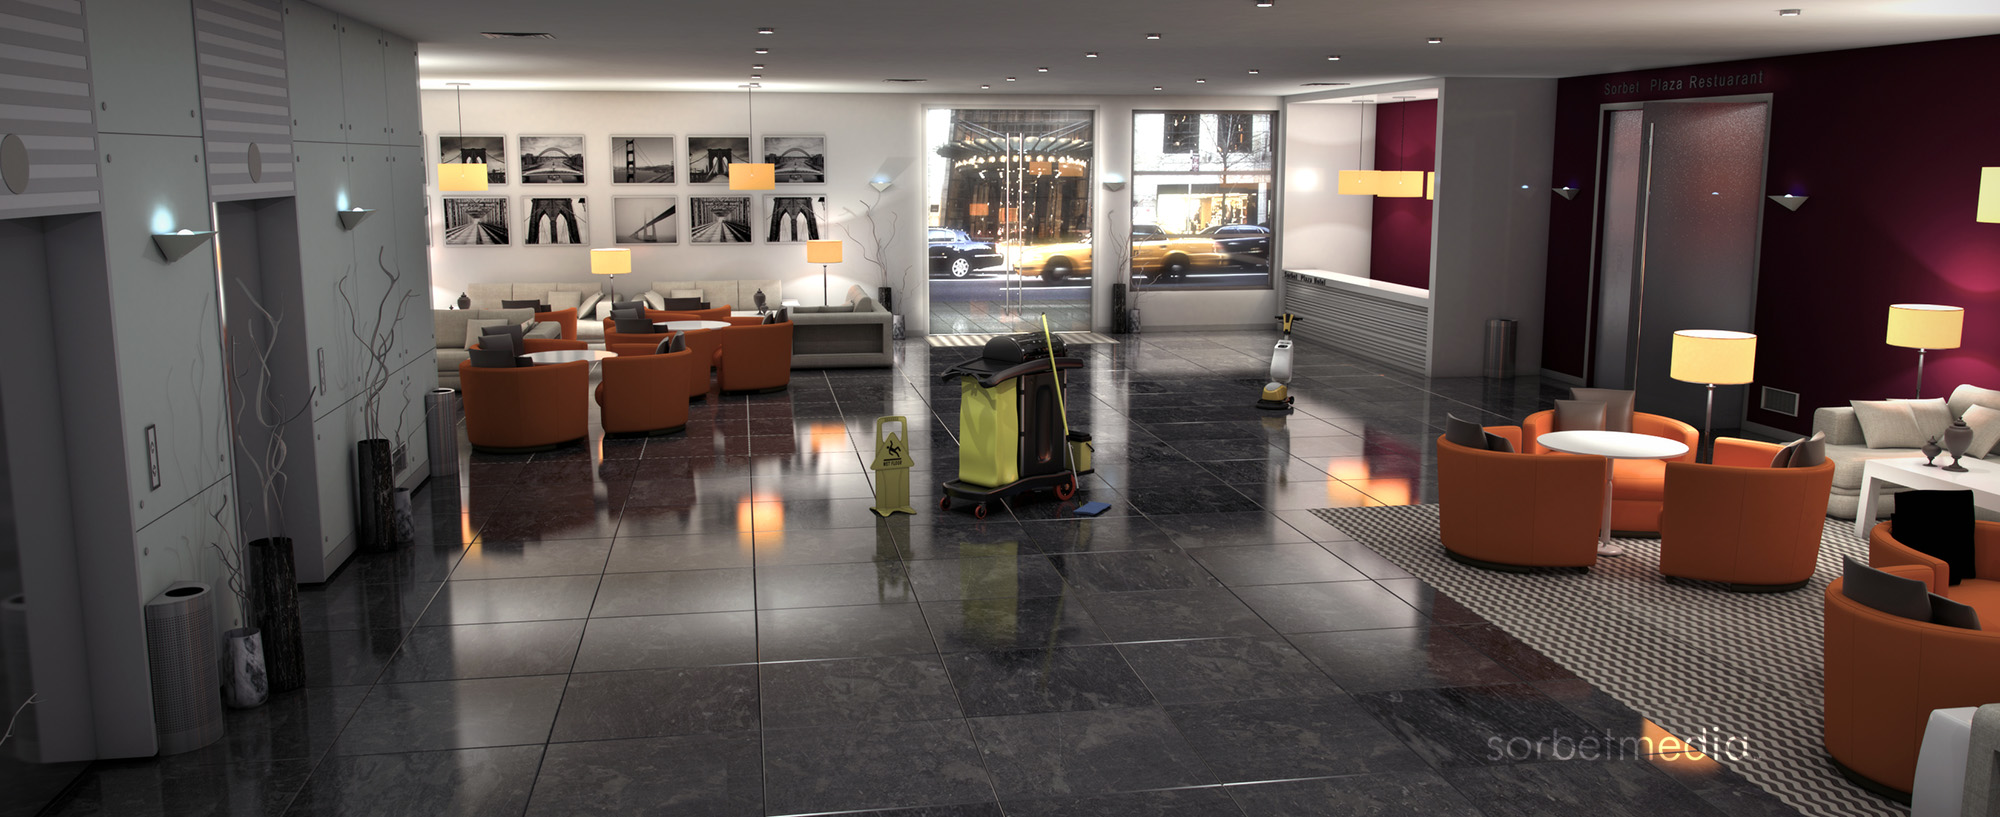 Hotel Reception 3D Concept Walkthrough